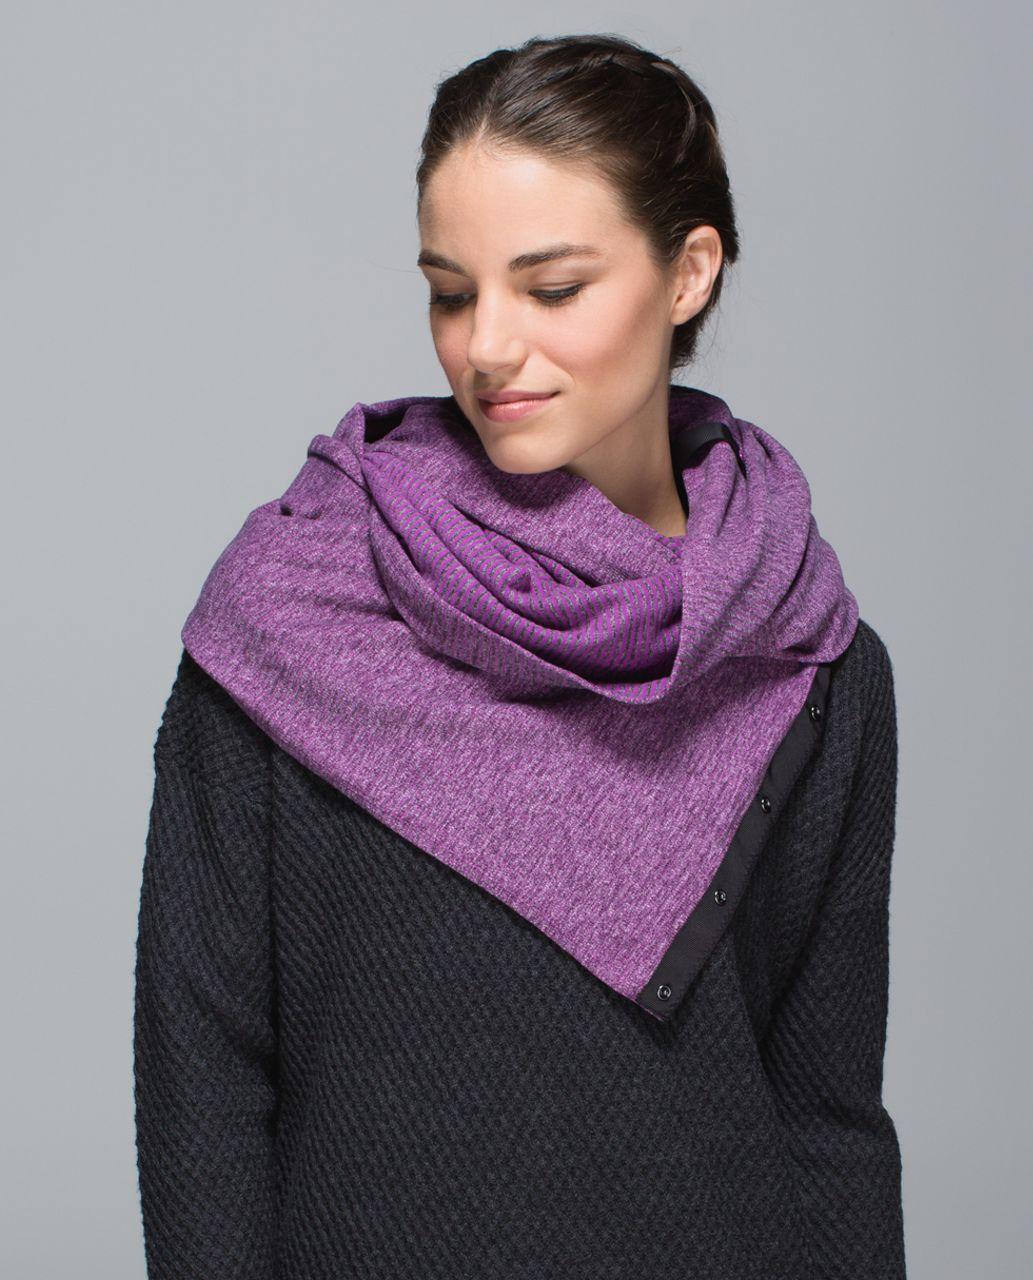 Lululemon Vinyasa Scarf *Rulu - Mini Check Pique Ultra Violet Heathered Black